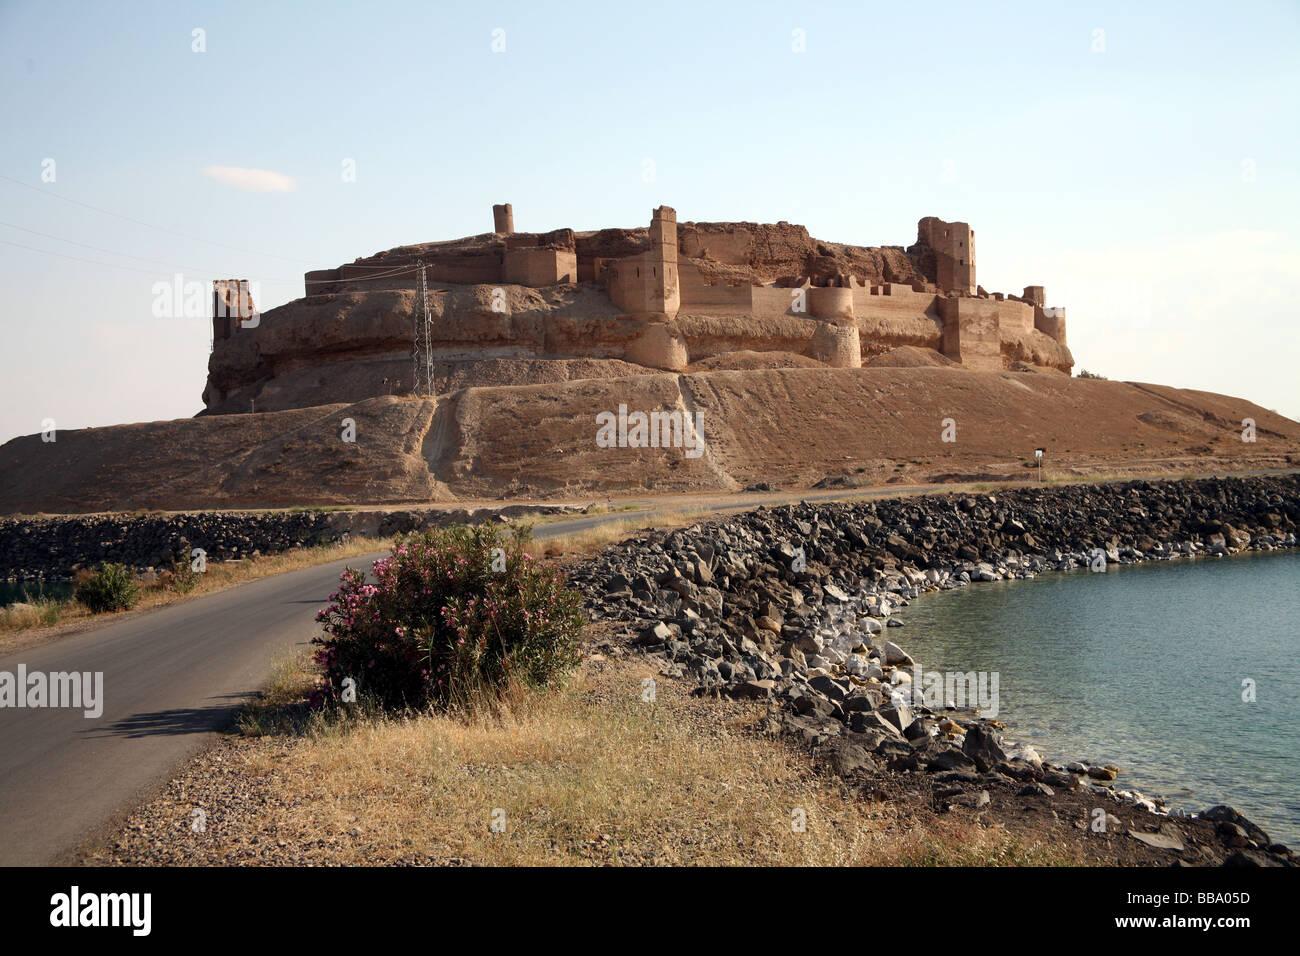 Qala' at ja' abar near lake Assad Syria - Stock Image